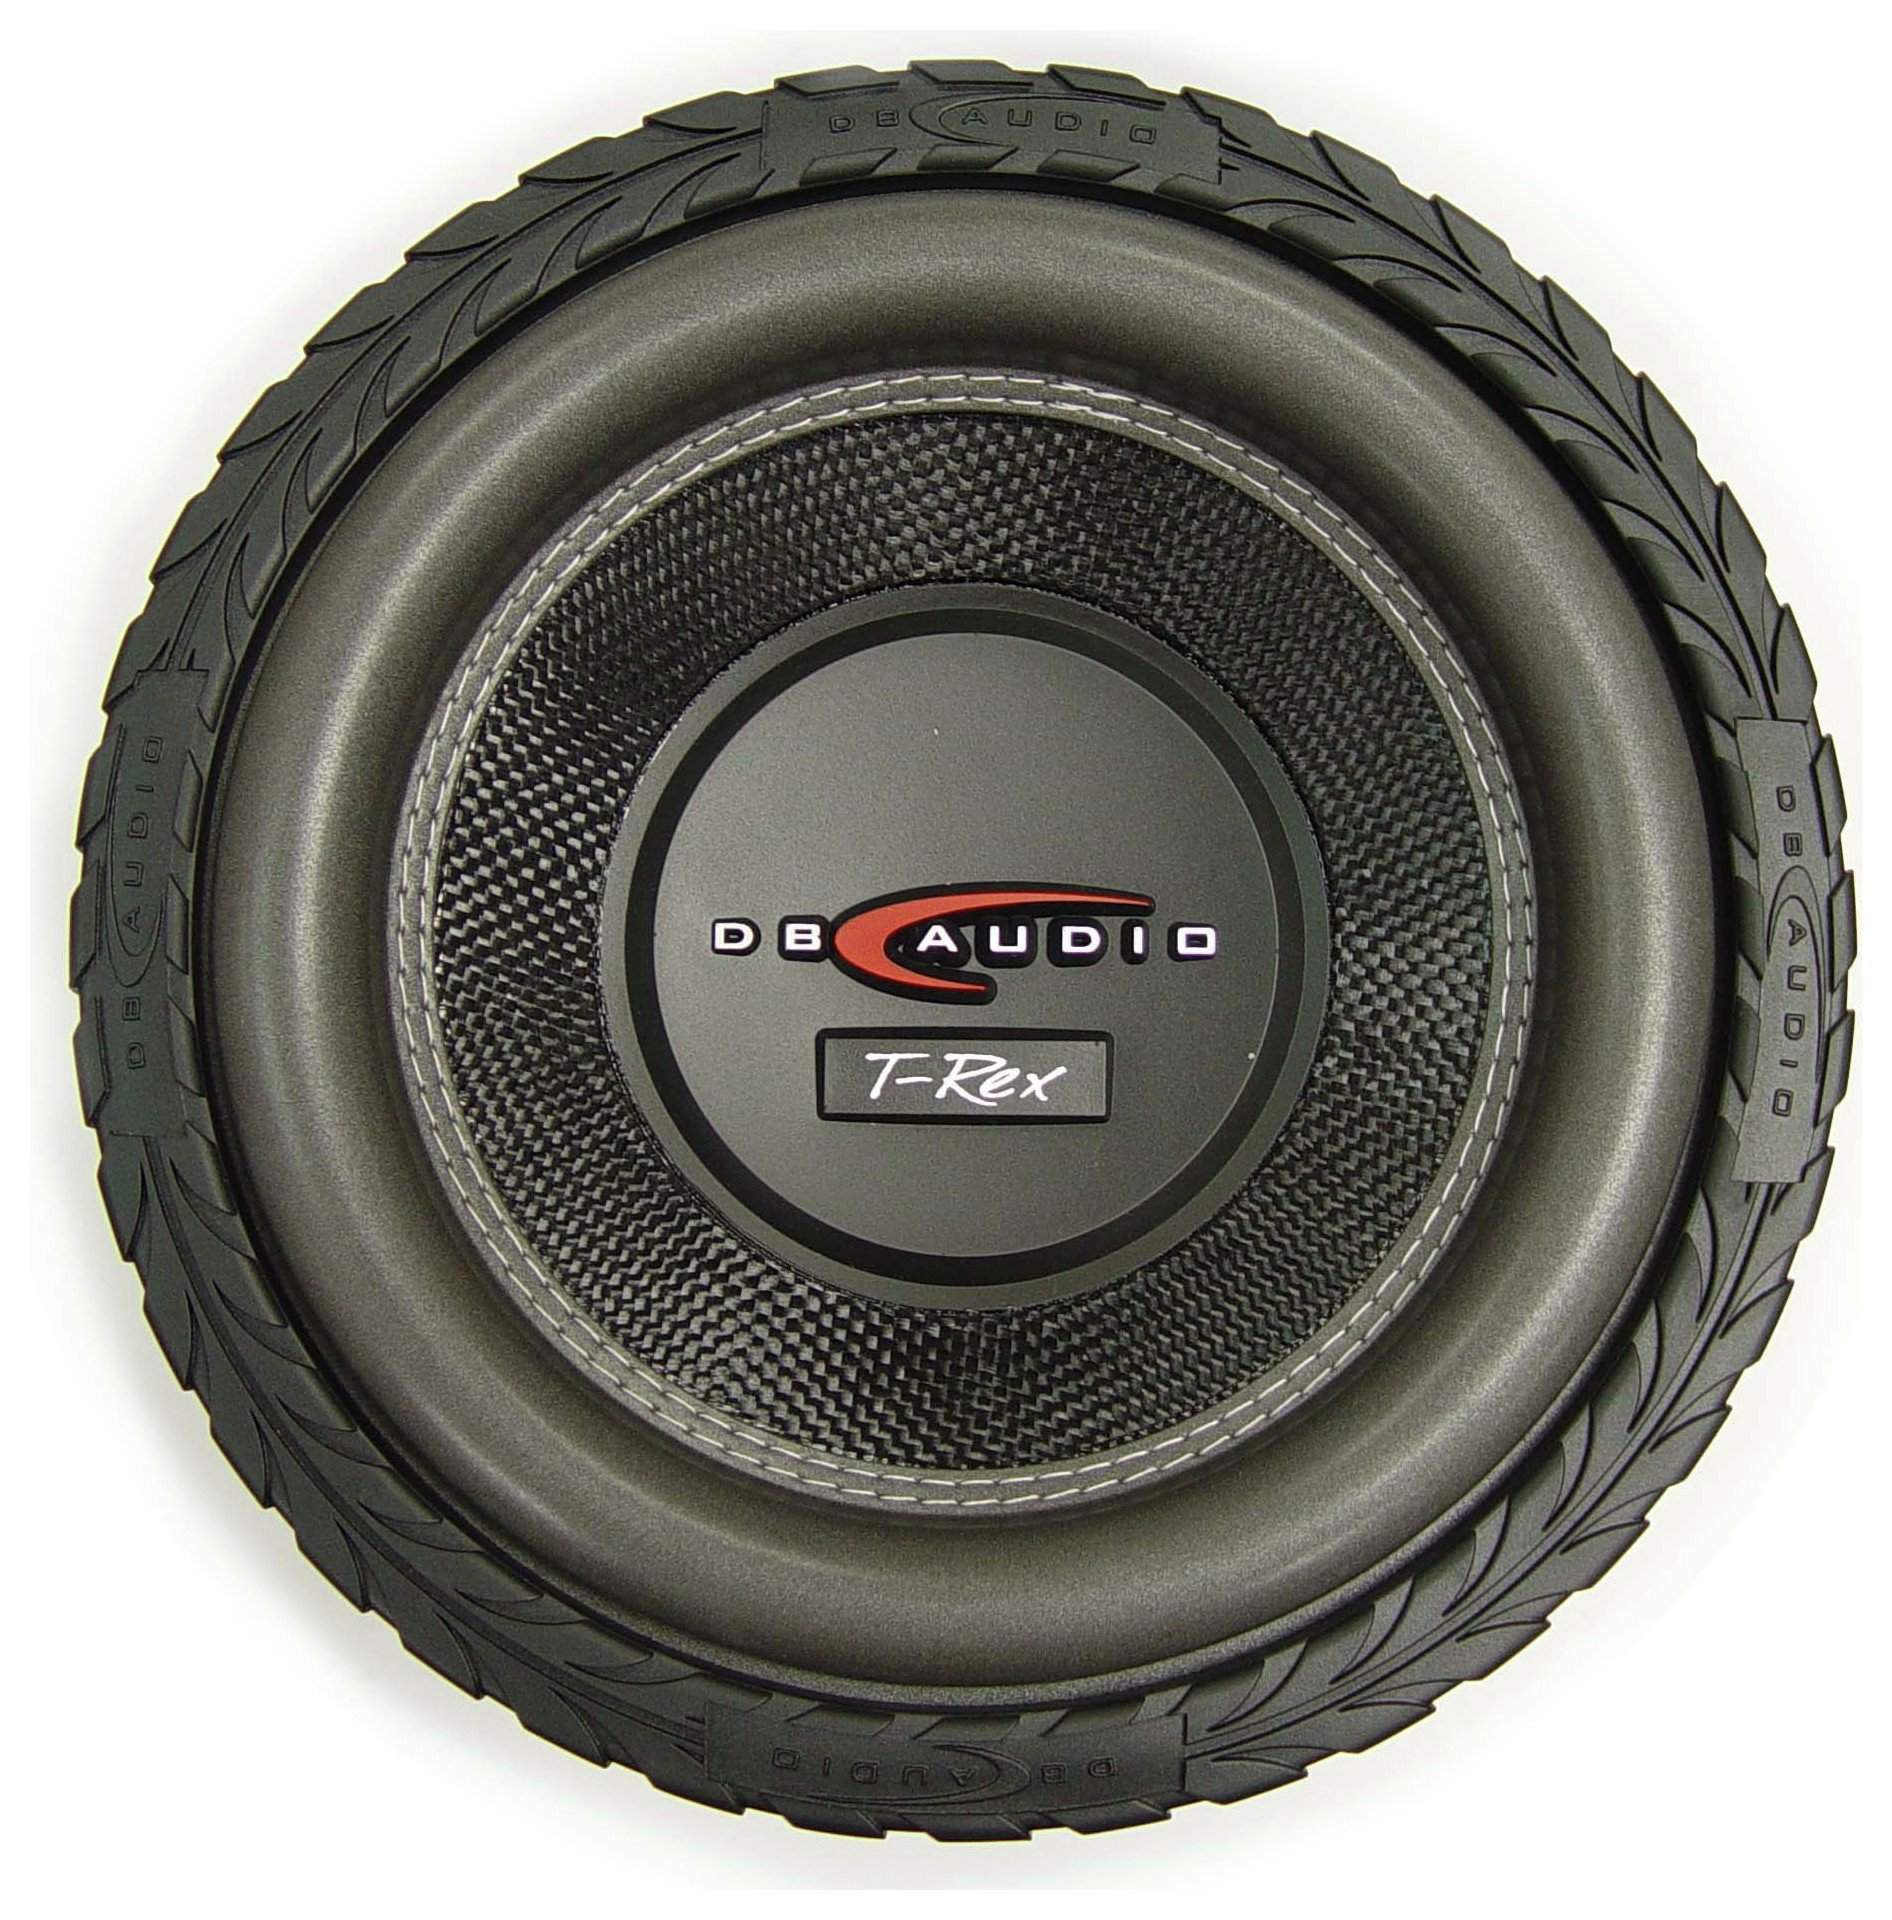 T Rex Car Price >> Db Audio T Rex 15 5487422 Argos Price Tracker